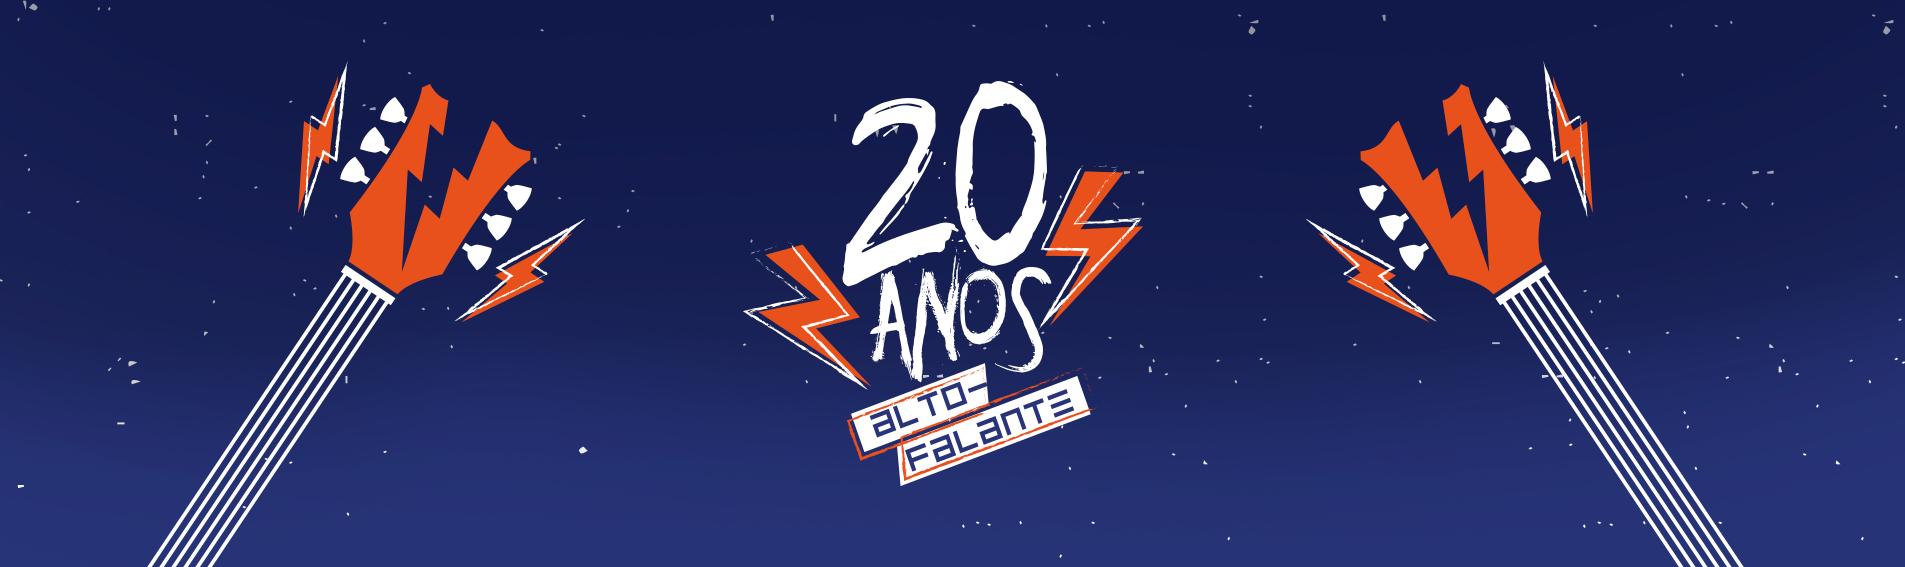 site-banner_altofalante20anos